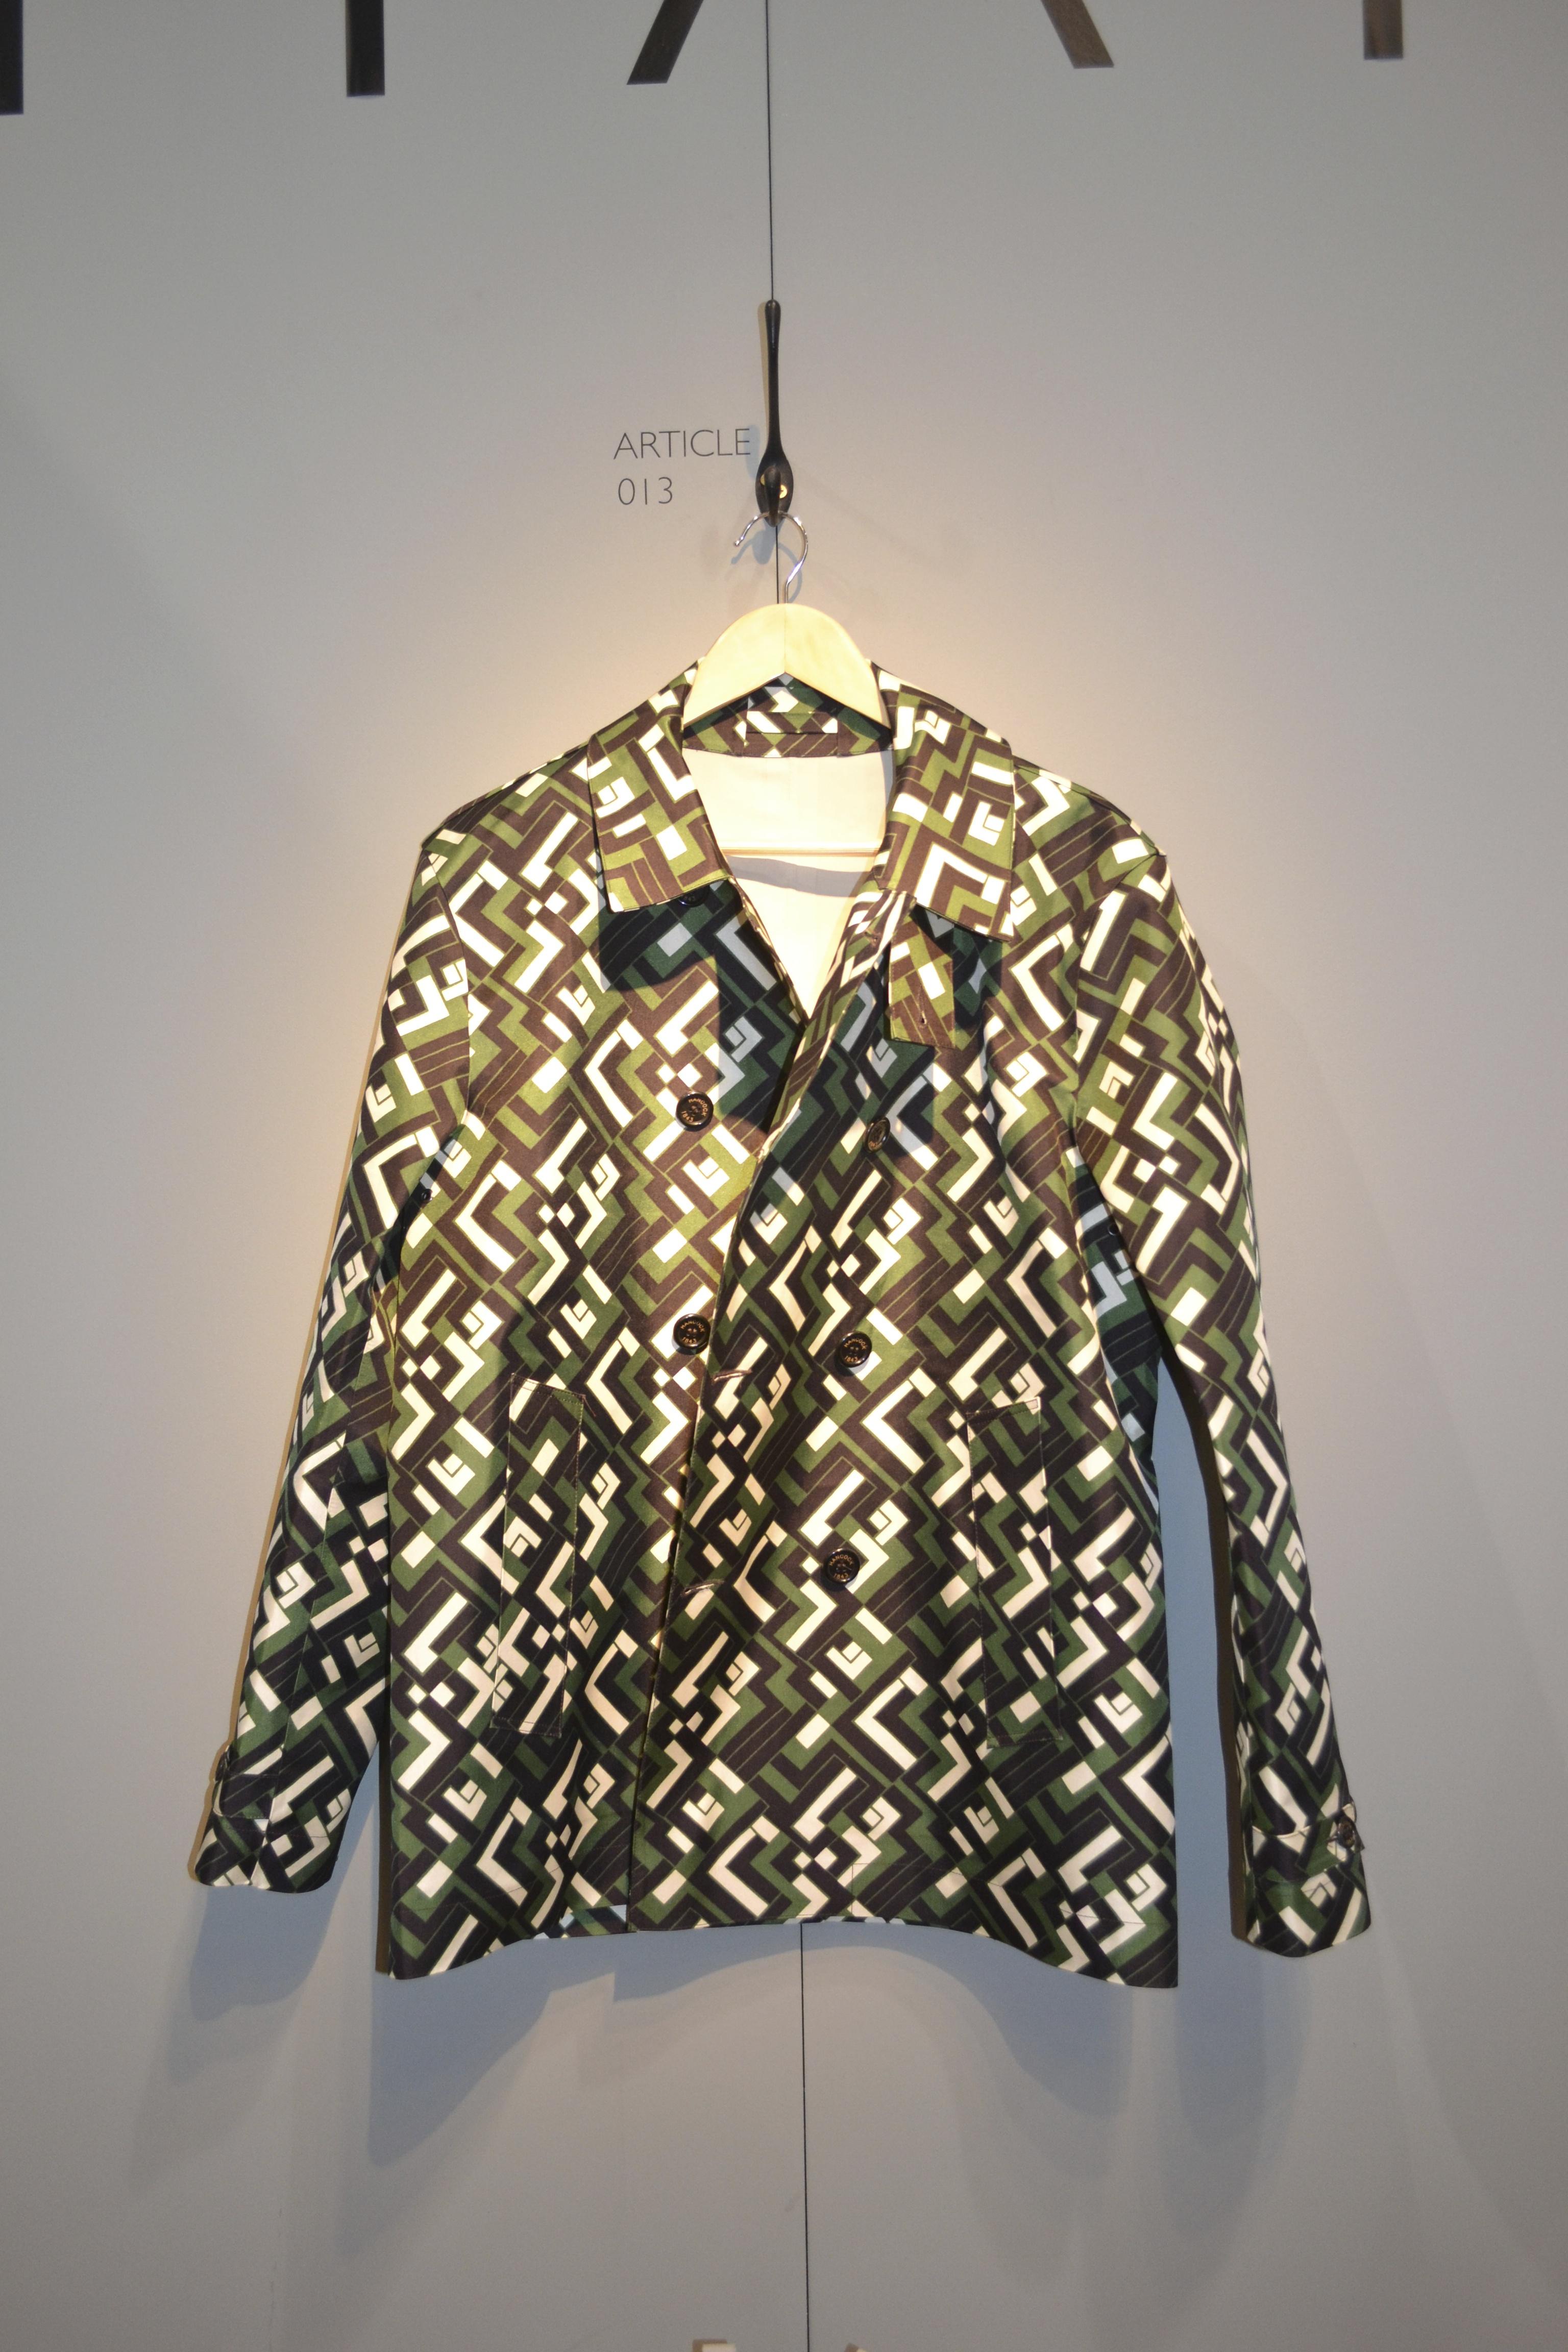 Hancock Coats at Pitti Uomo